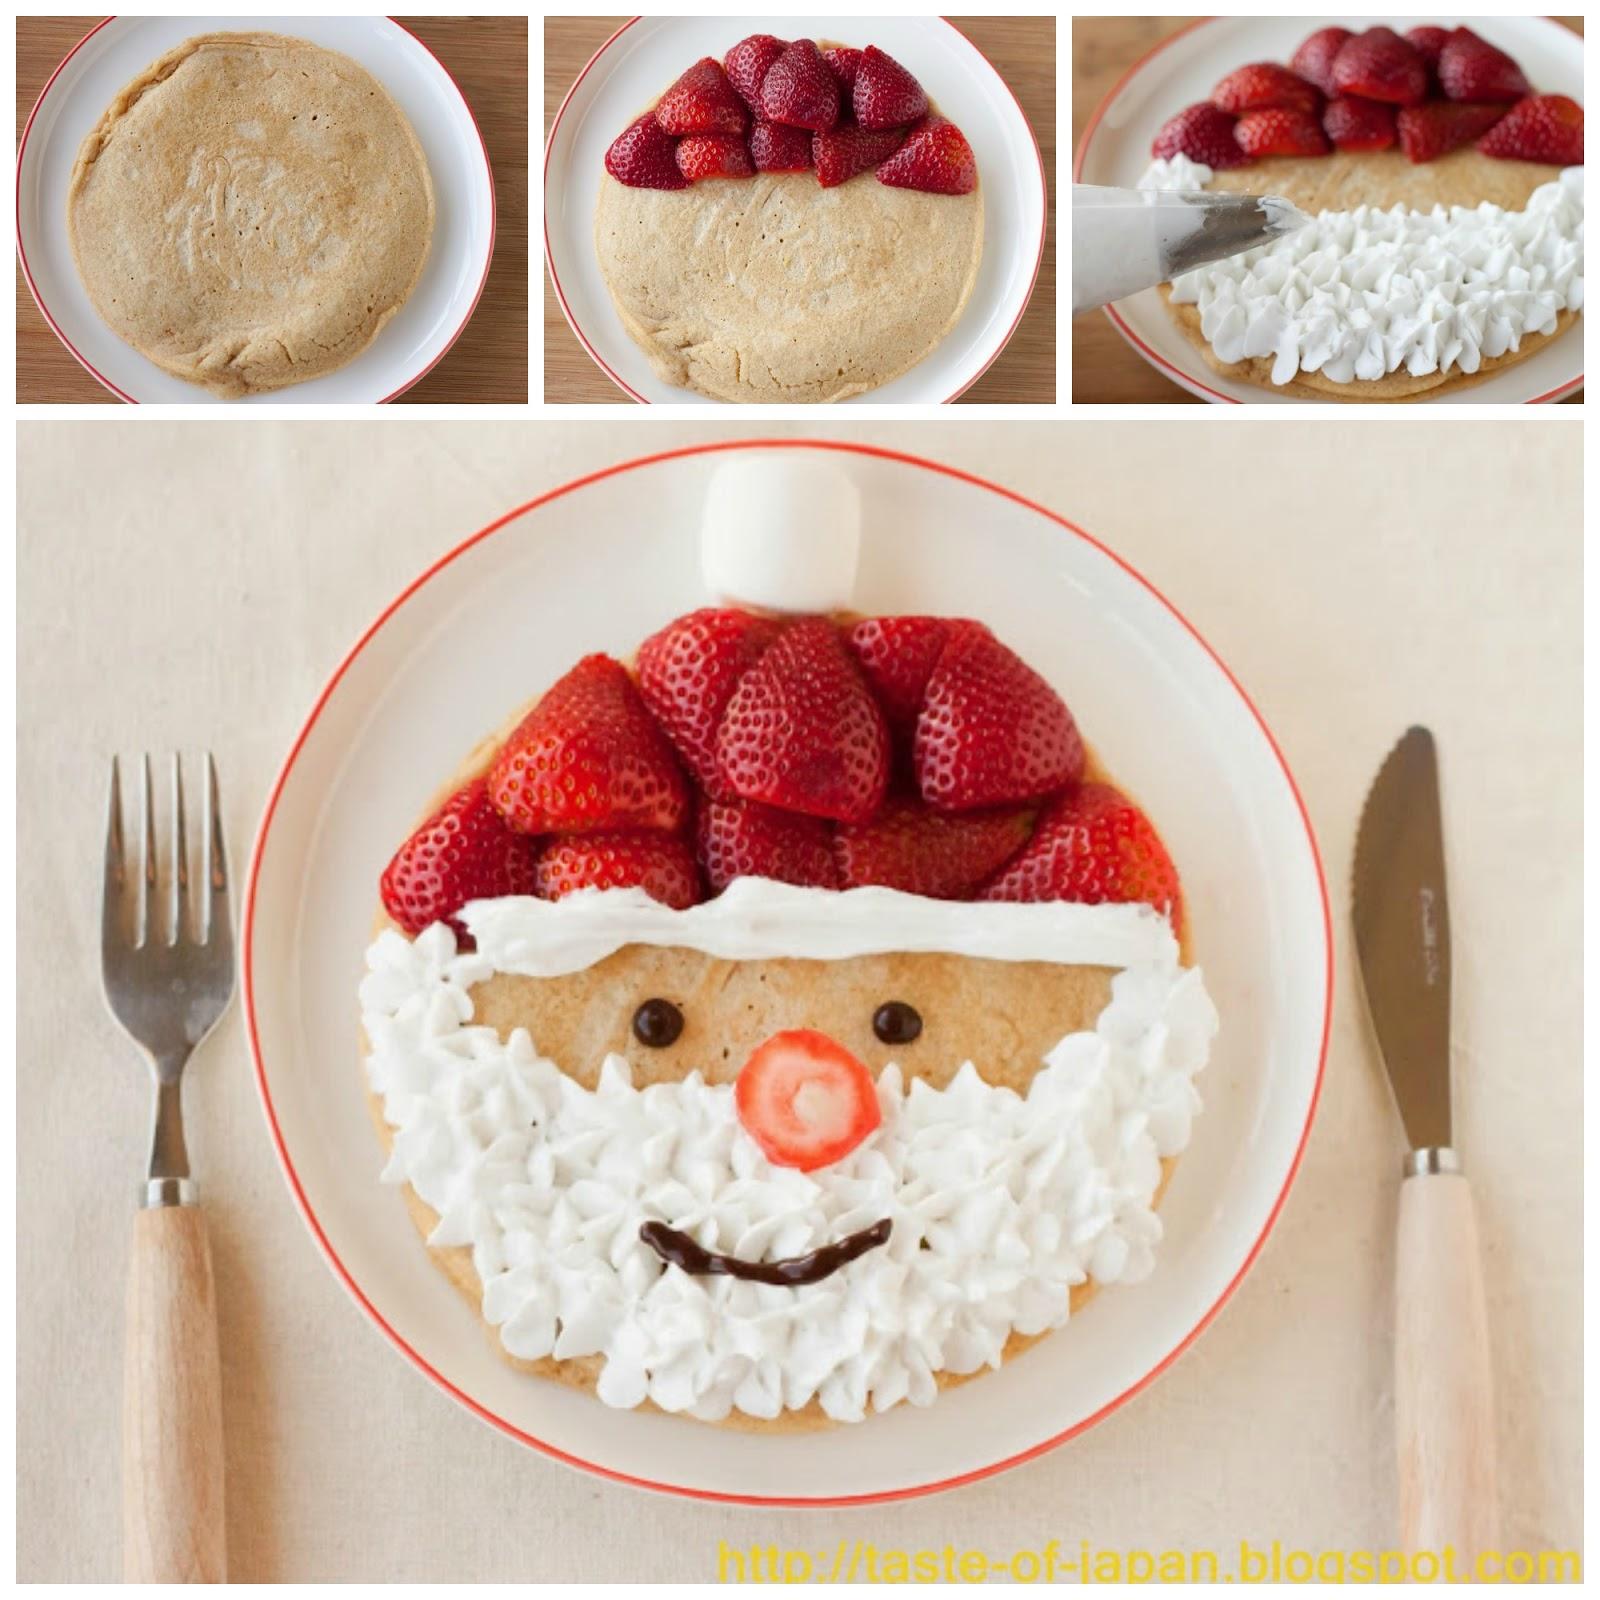 Fun Finds Friday With Christmas Fun Food & DIY Craft Ideas